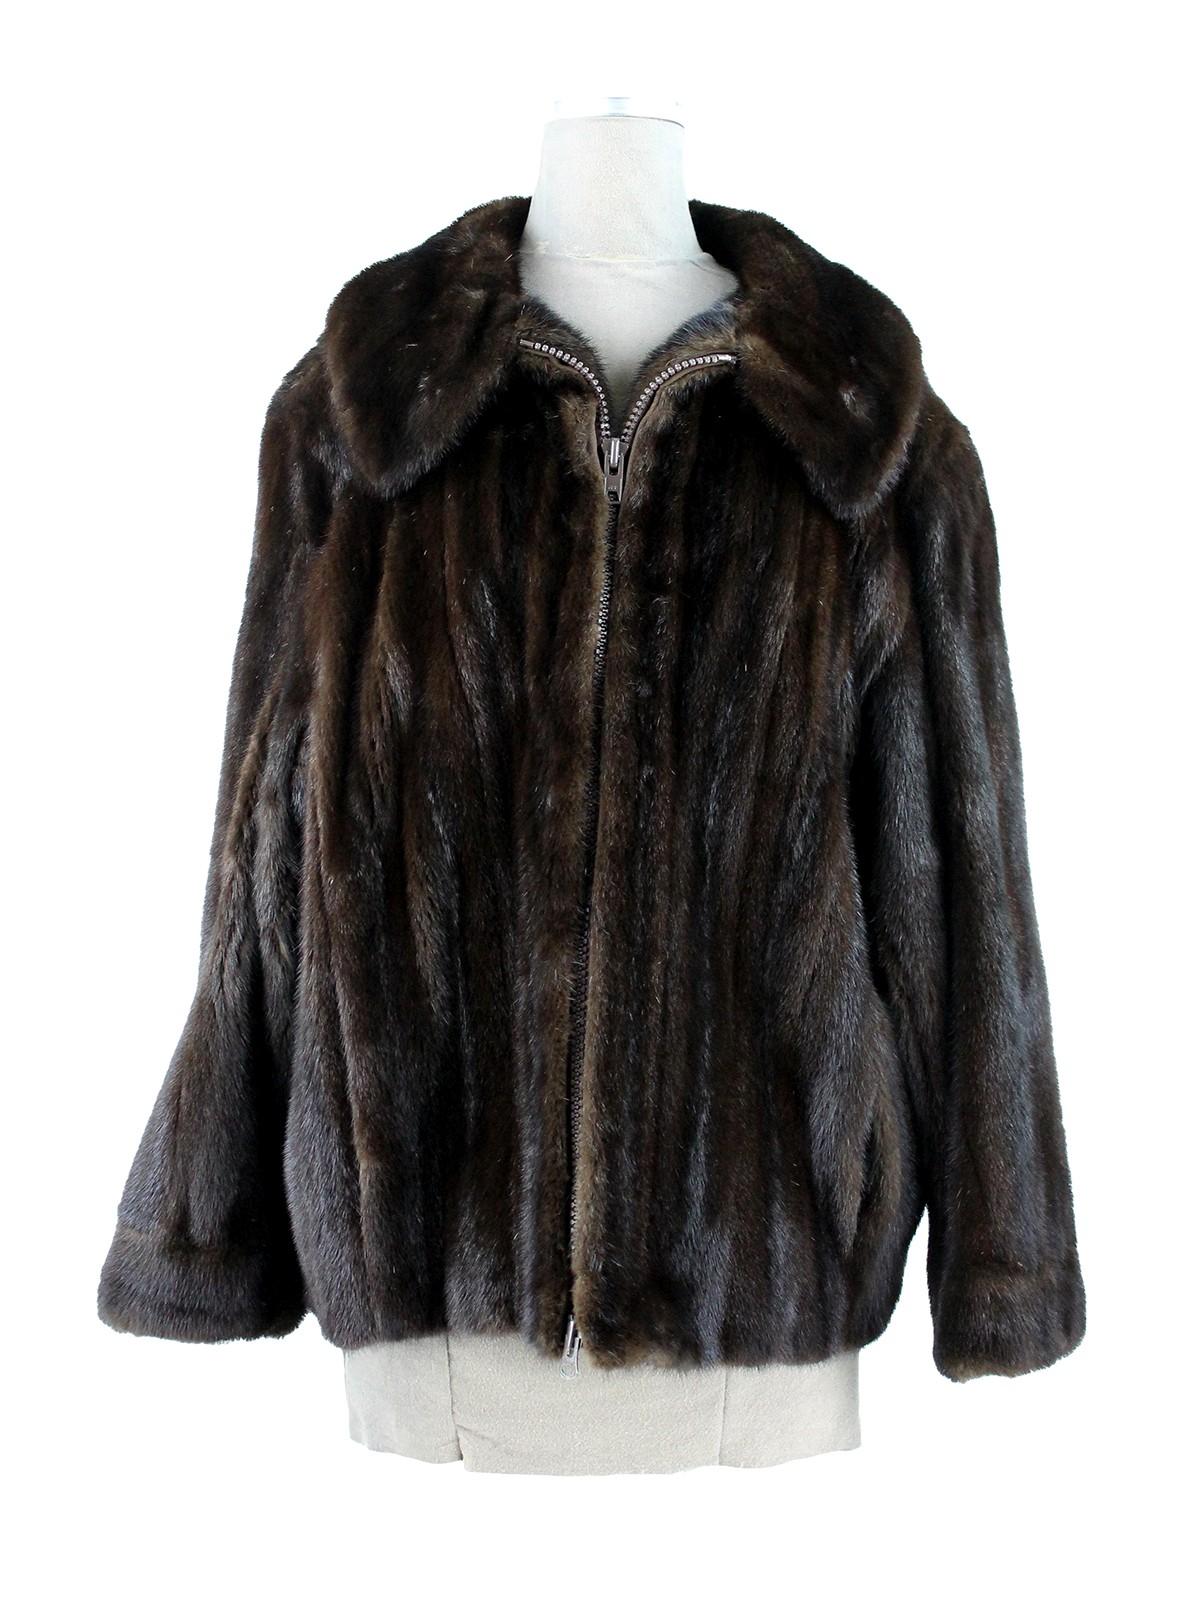 Man's Dark Mahogany Mink Fur Jacket